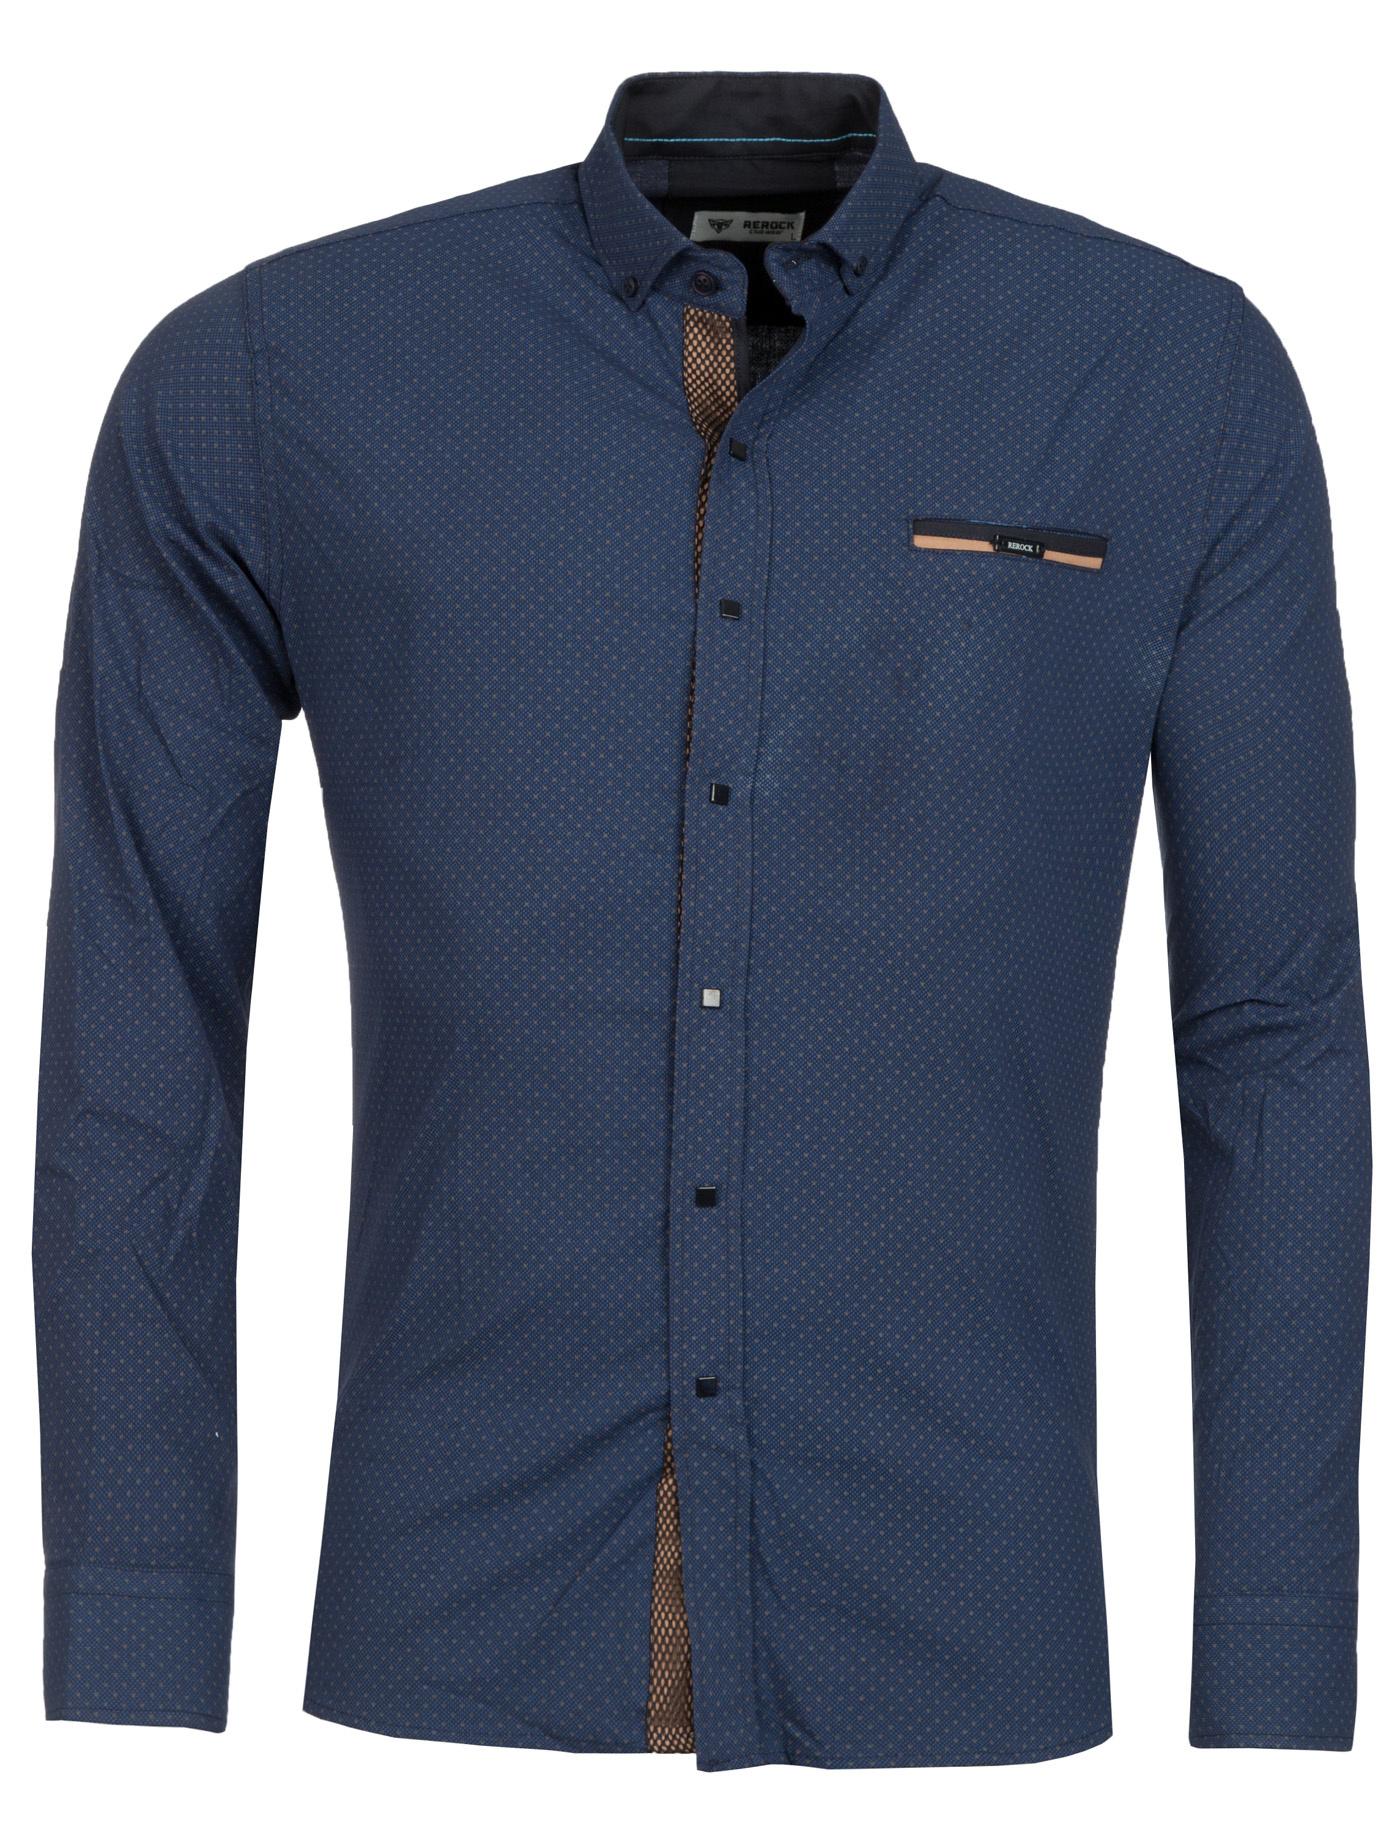 Overhemd marineblauw - bruin